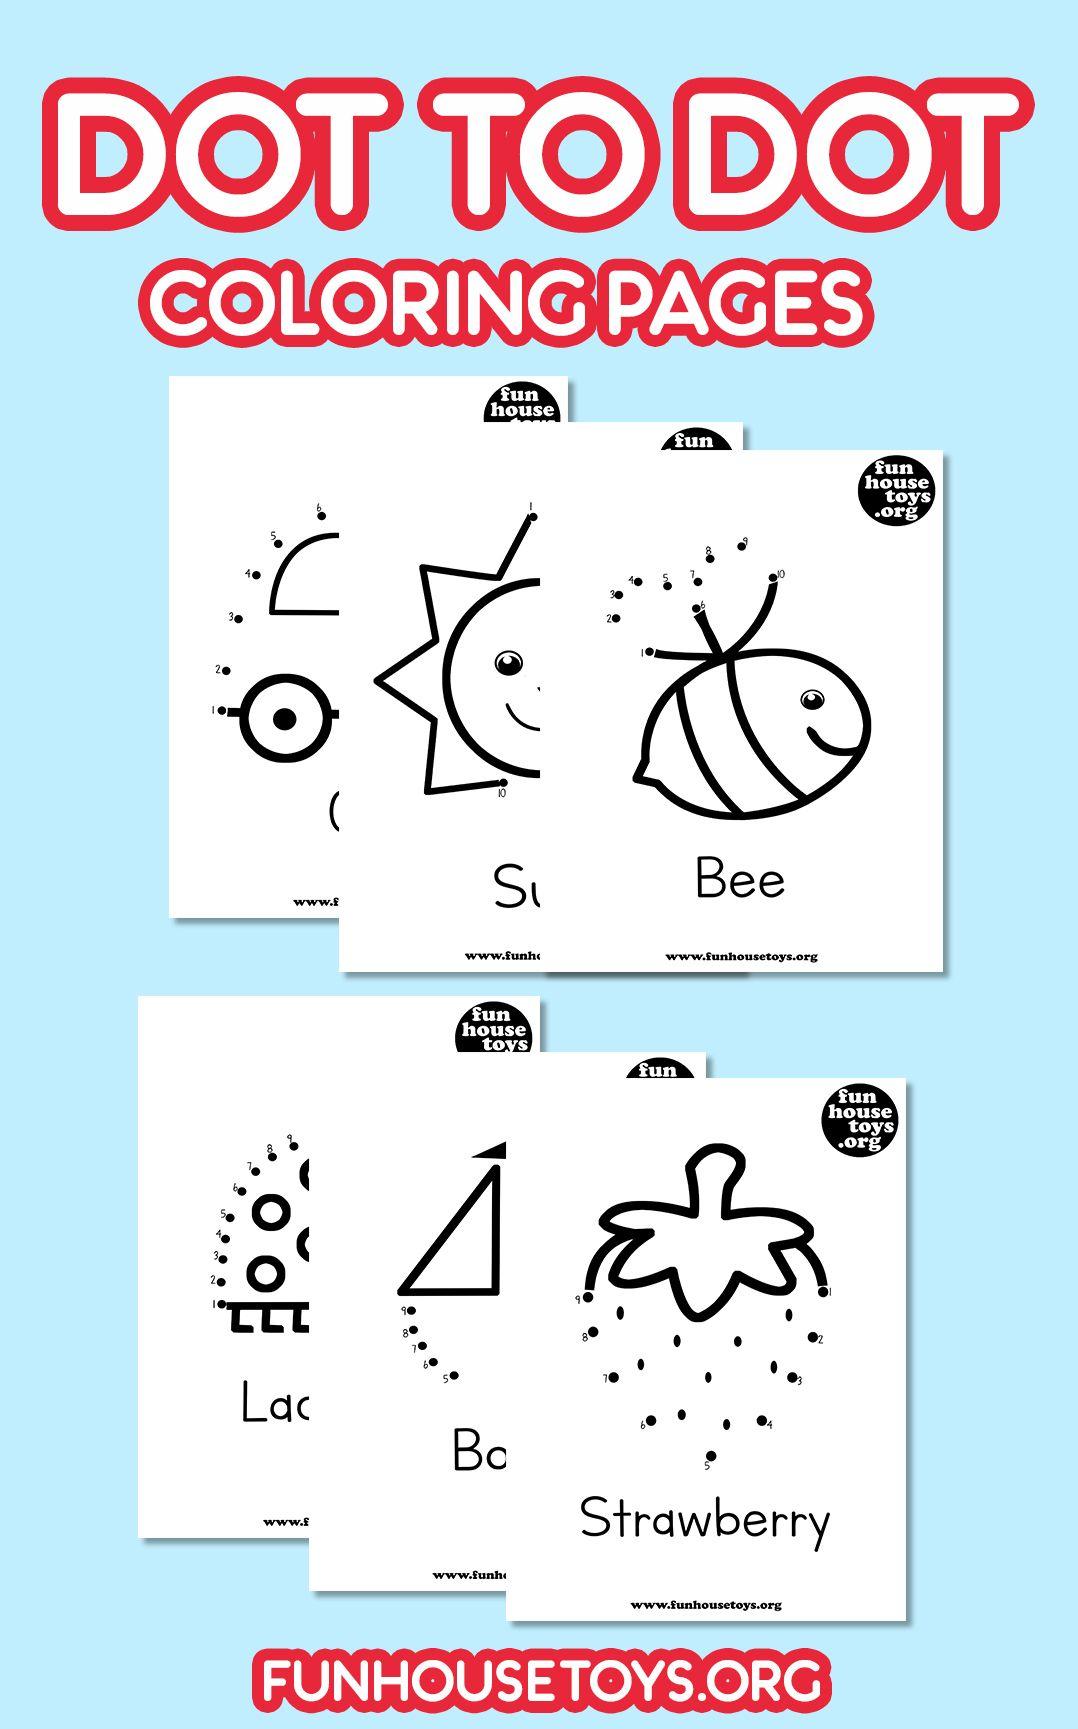 dottodots worksheets aren't just fun drawing activities